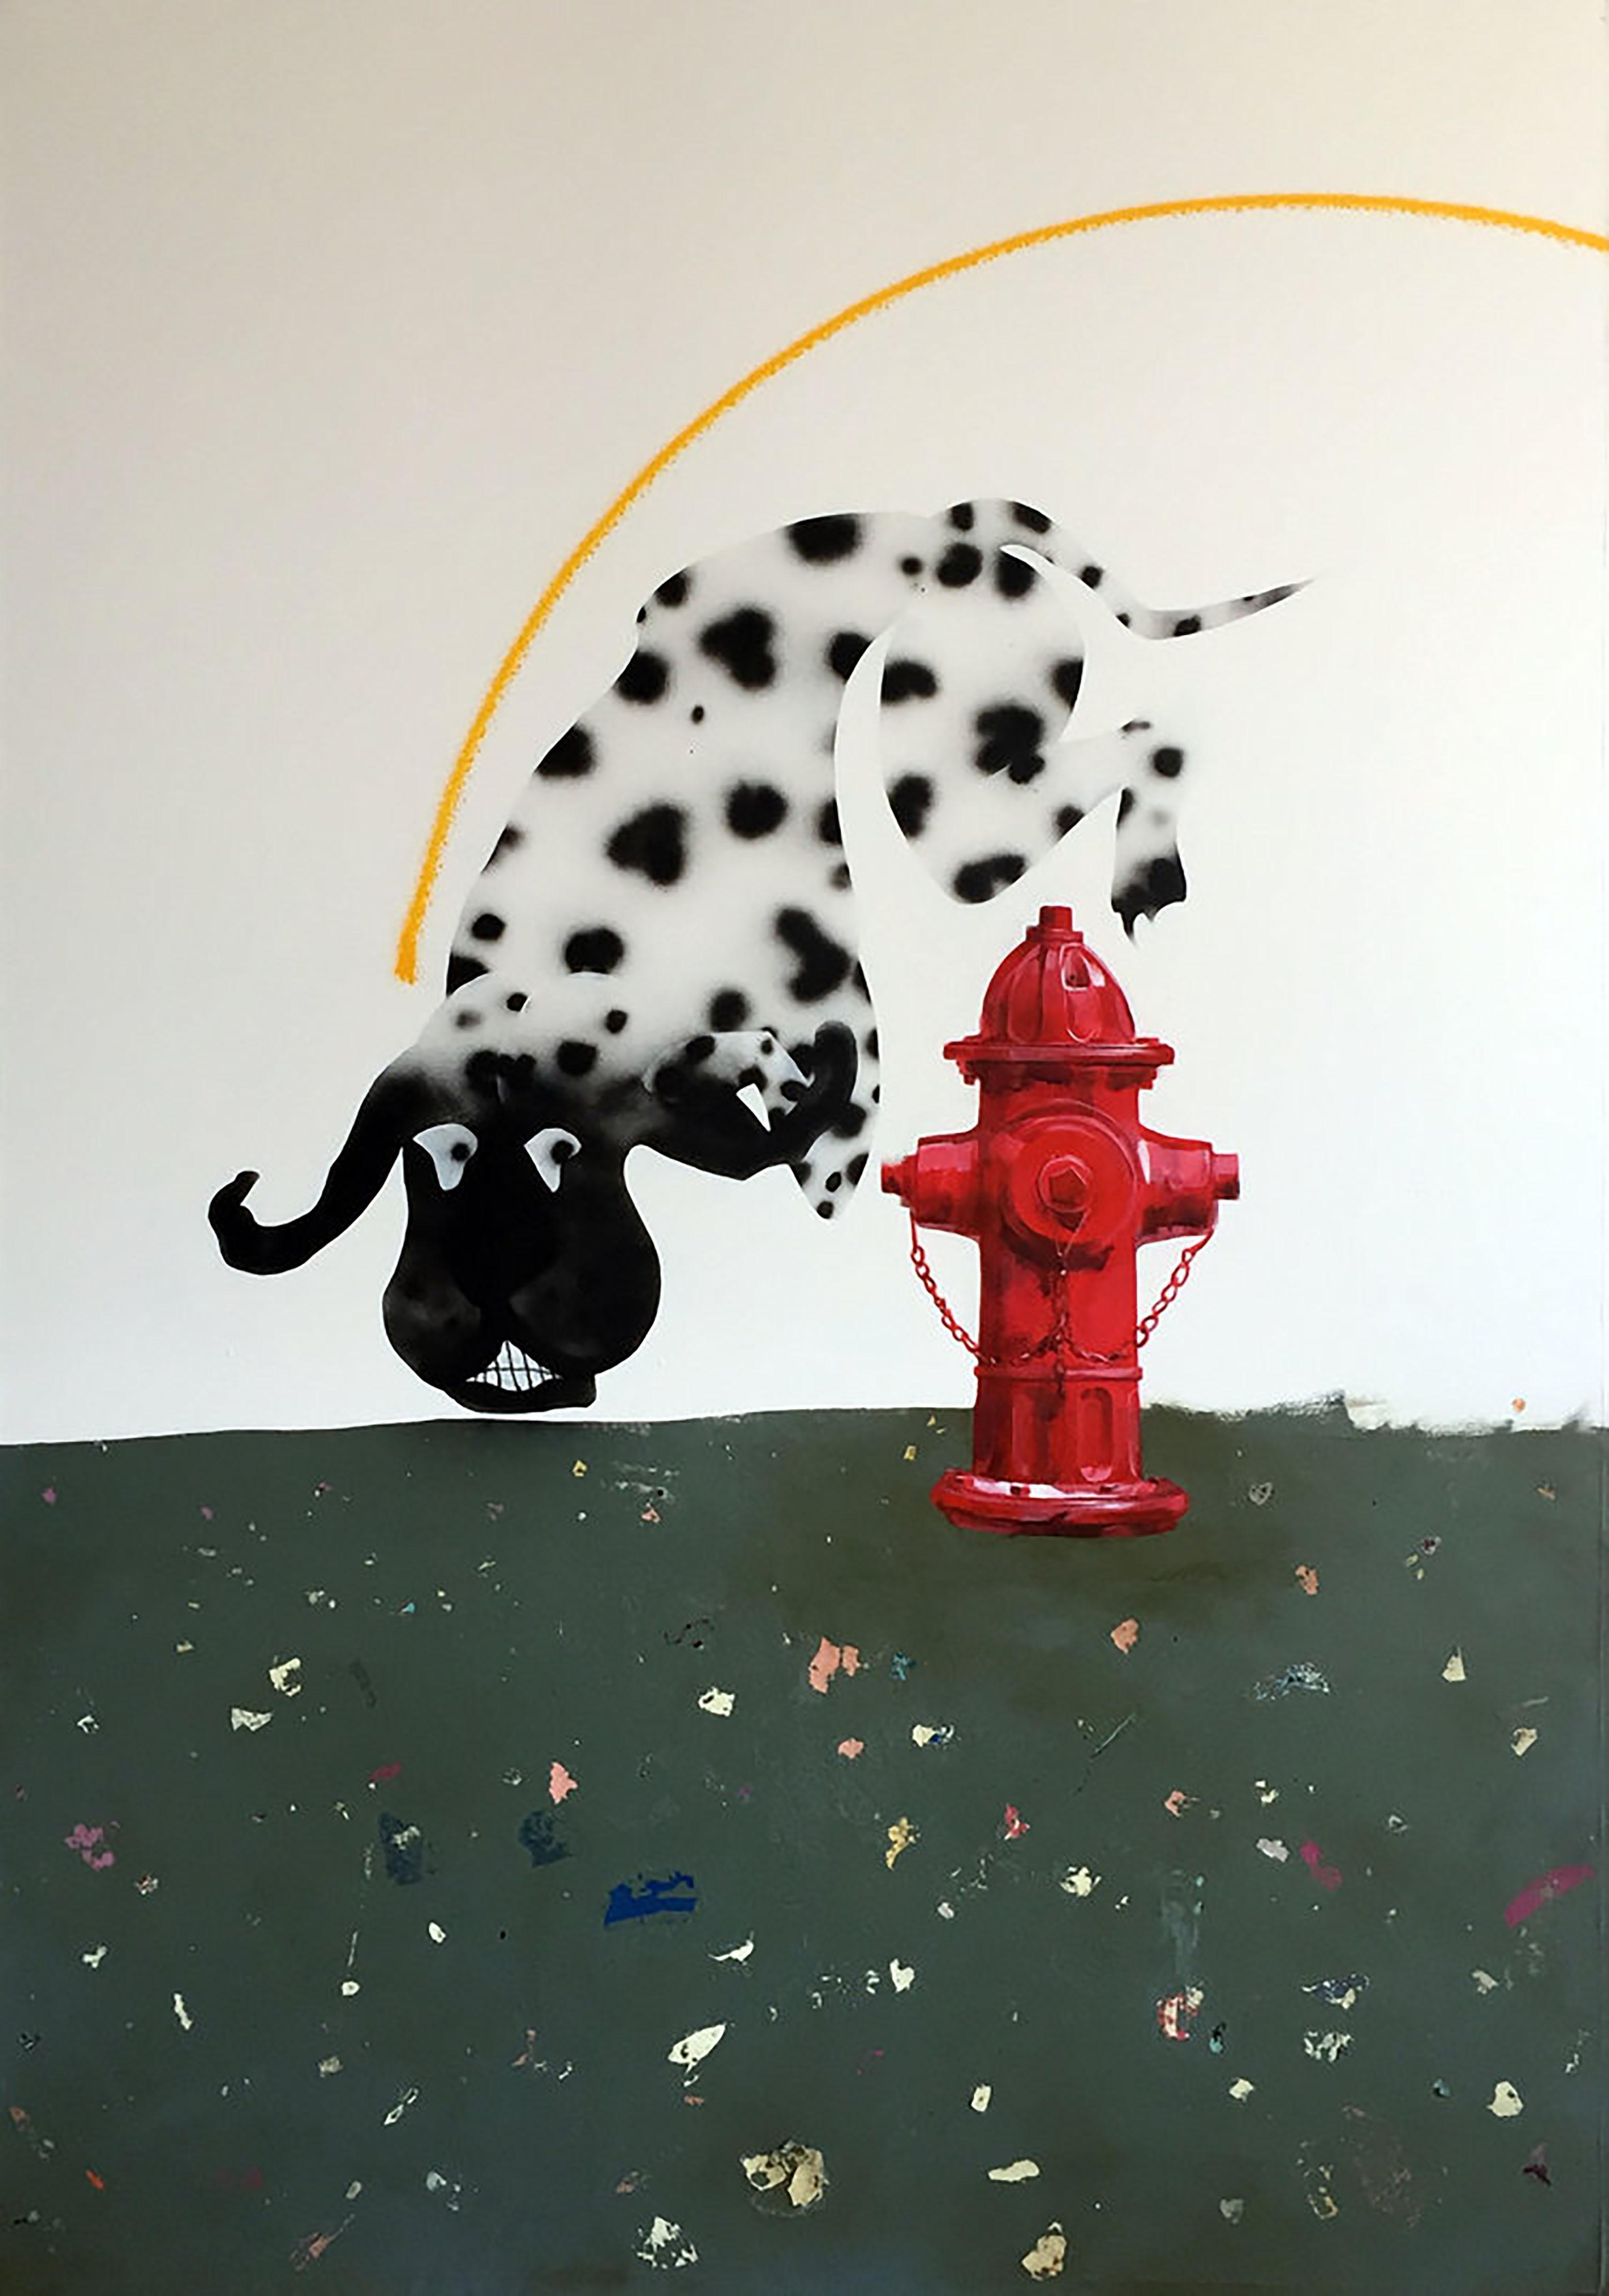 Hot Pavement, 2017, dalmatian, fire hydrant, animal, dog, figurative, white, red